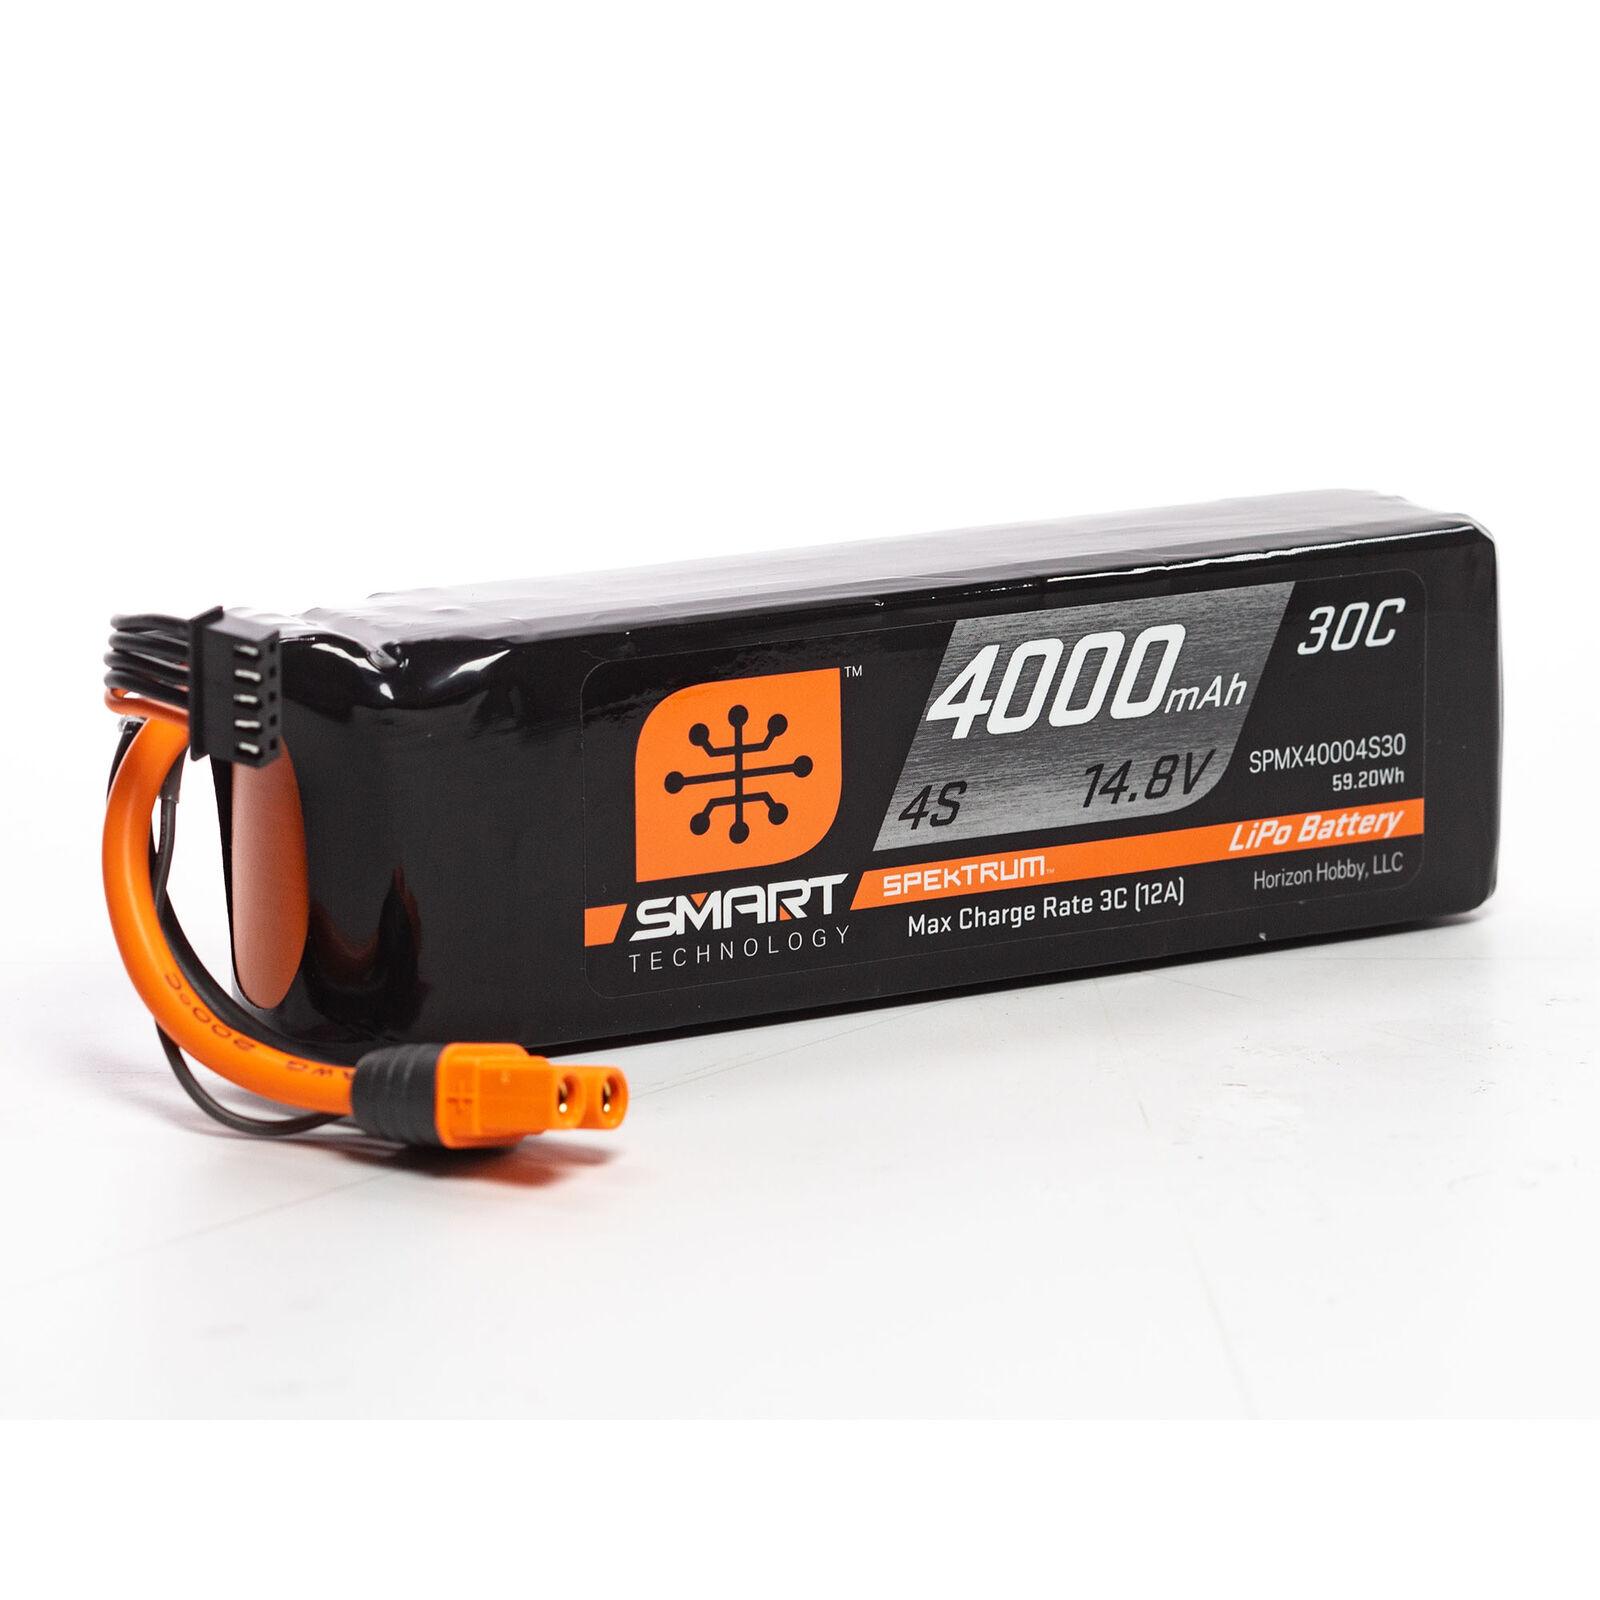 14.8V 4000mAh 4S 30C Smart LiPo Battery: IC3